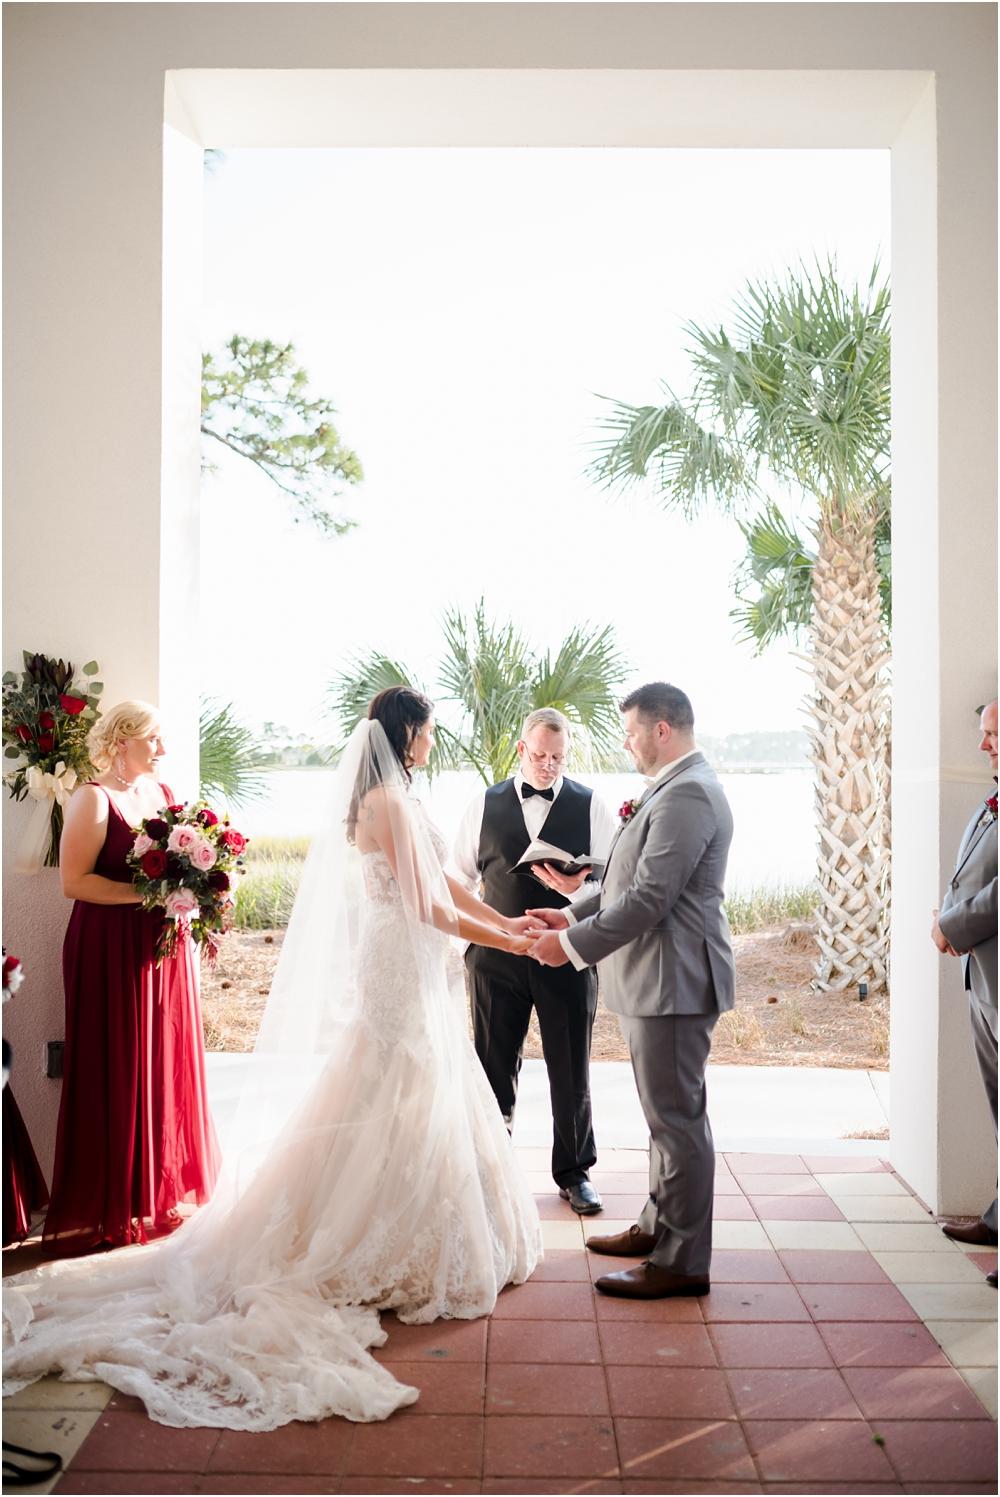 imhof-sheraton-panama-city-beach-florida-wedding-photographer-kiersten-grant-88.jpg